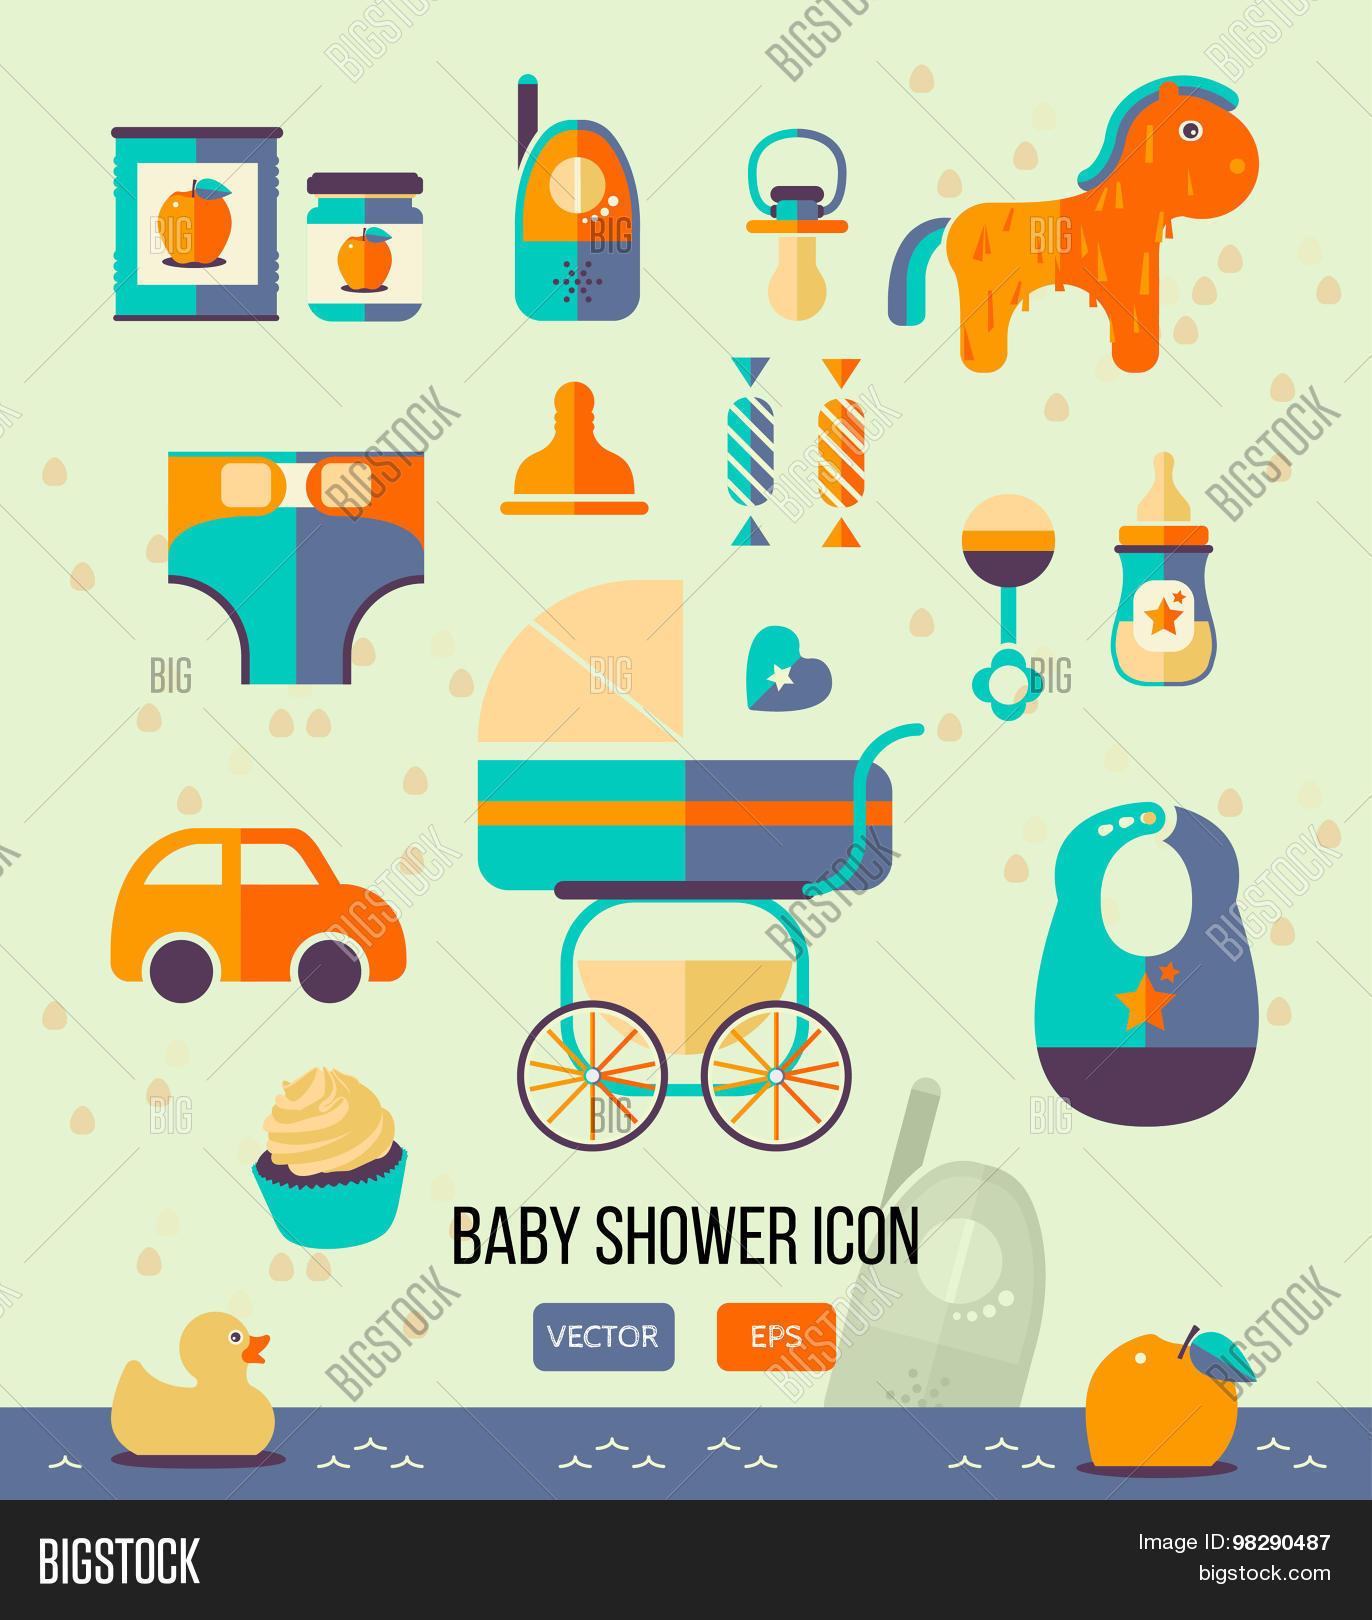 Vector illustration baby shower vector photo bigstock vector illustration baby shower icon for invitation template web design flat style stopboris Choice Image